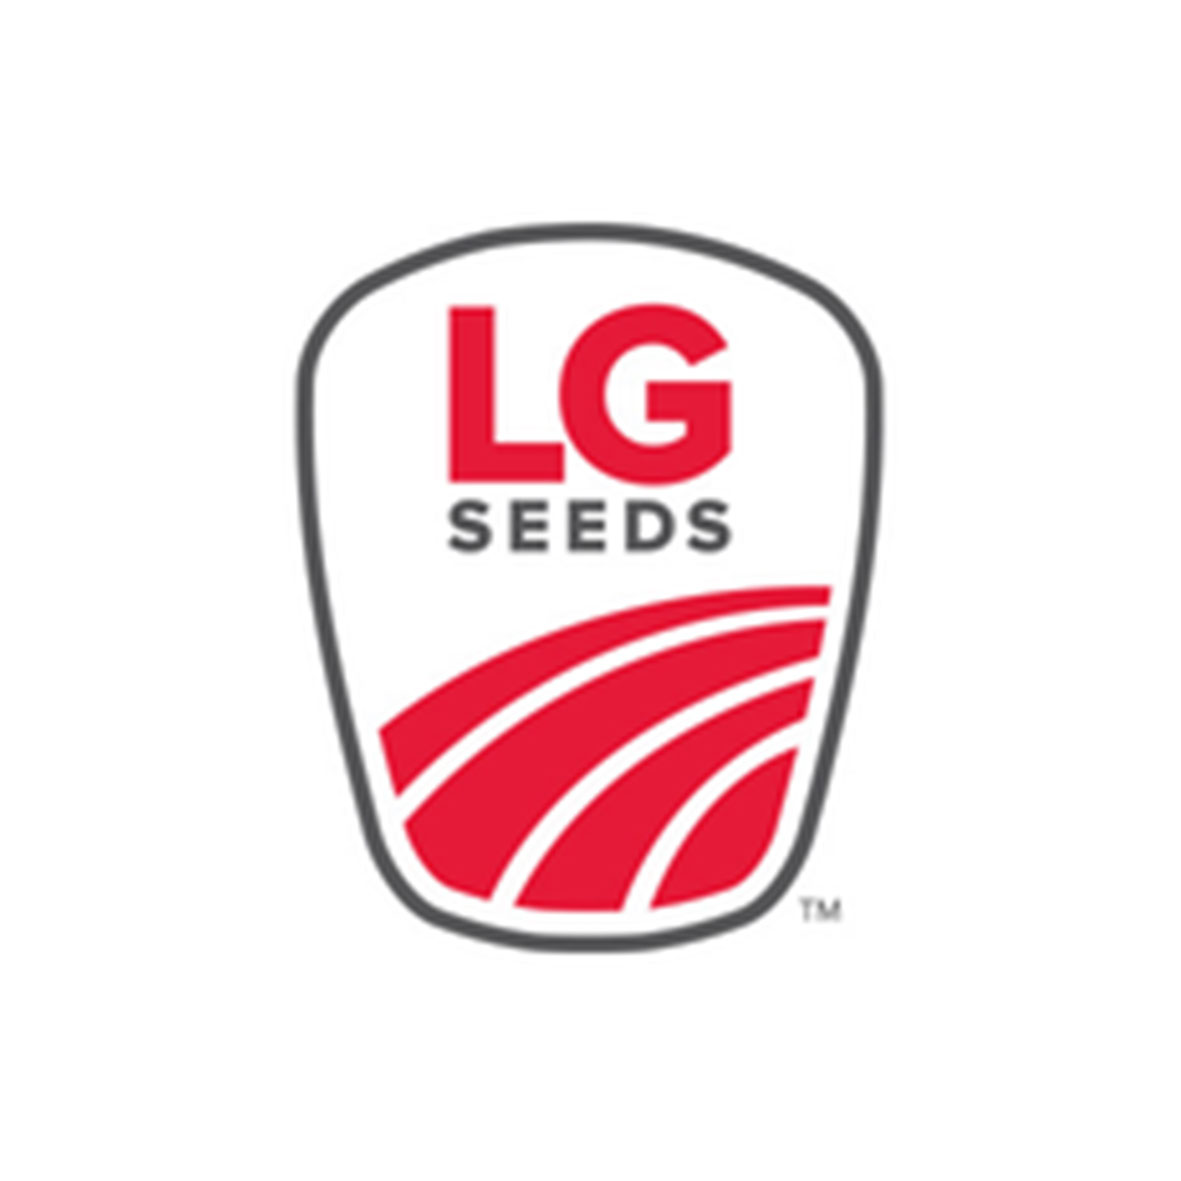 lg-seeds-partenaire-agroecologie